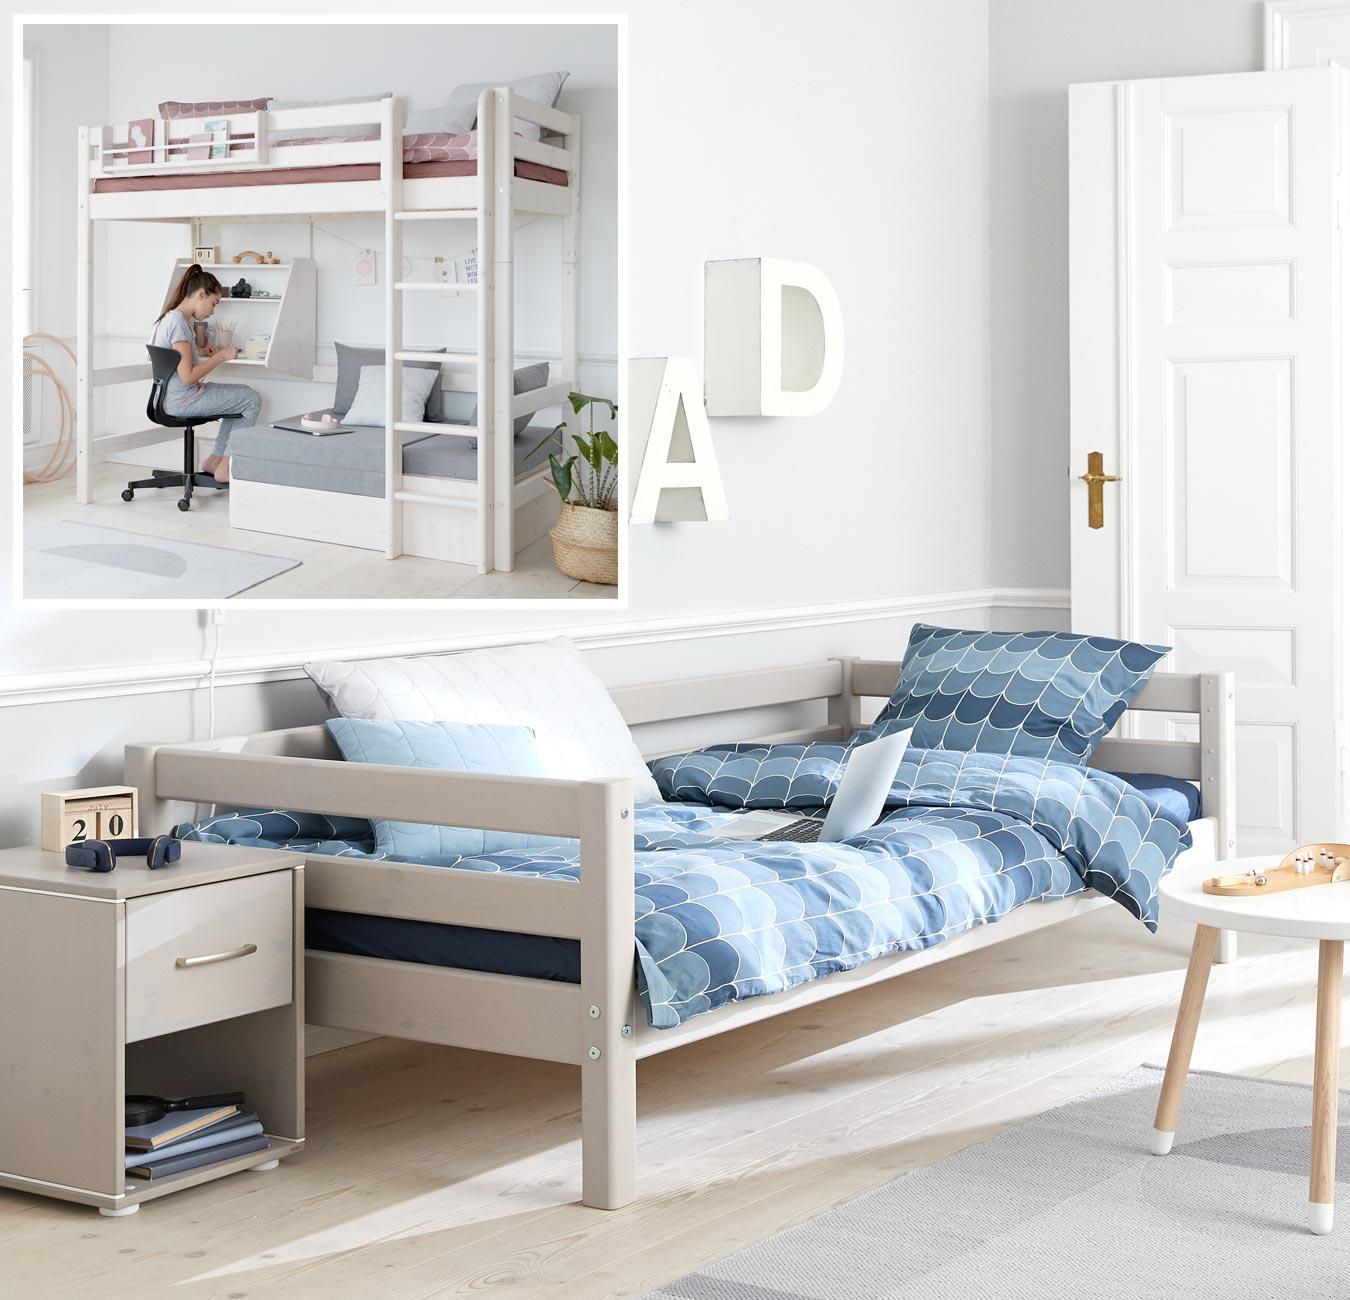 Full Size of Coole Betten Günstig Kaufen Flexa Balinesische Frankfurt Ebay 180x200 160x200 Ruf Fabrikverkauf Joop Amazon Test Nolte 200x220 überlänge Dico Hasena Rauch Bett Coole Betten